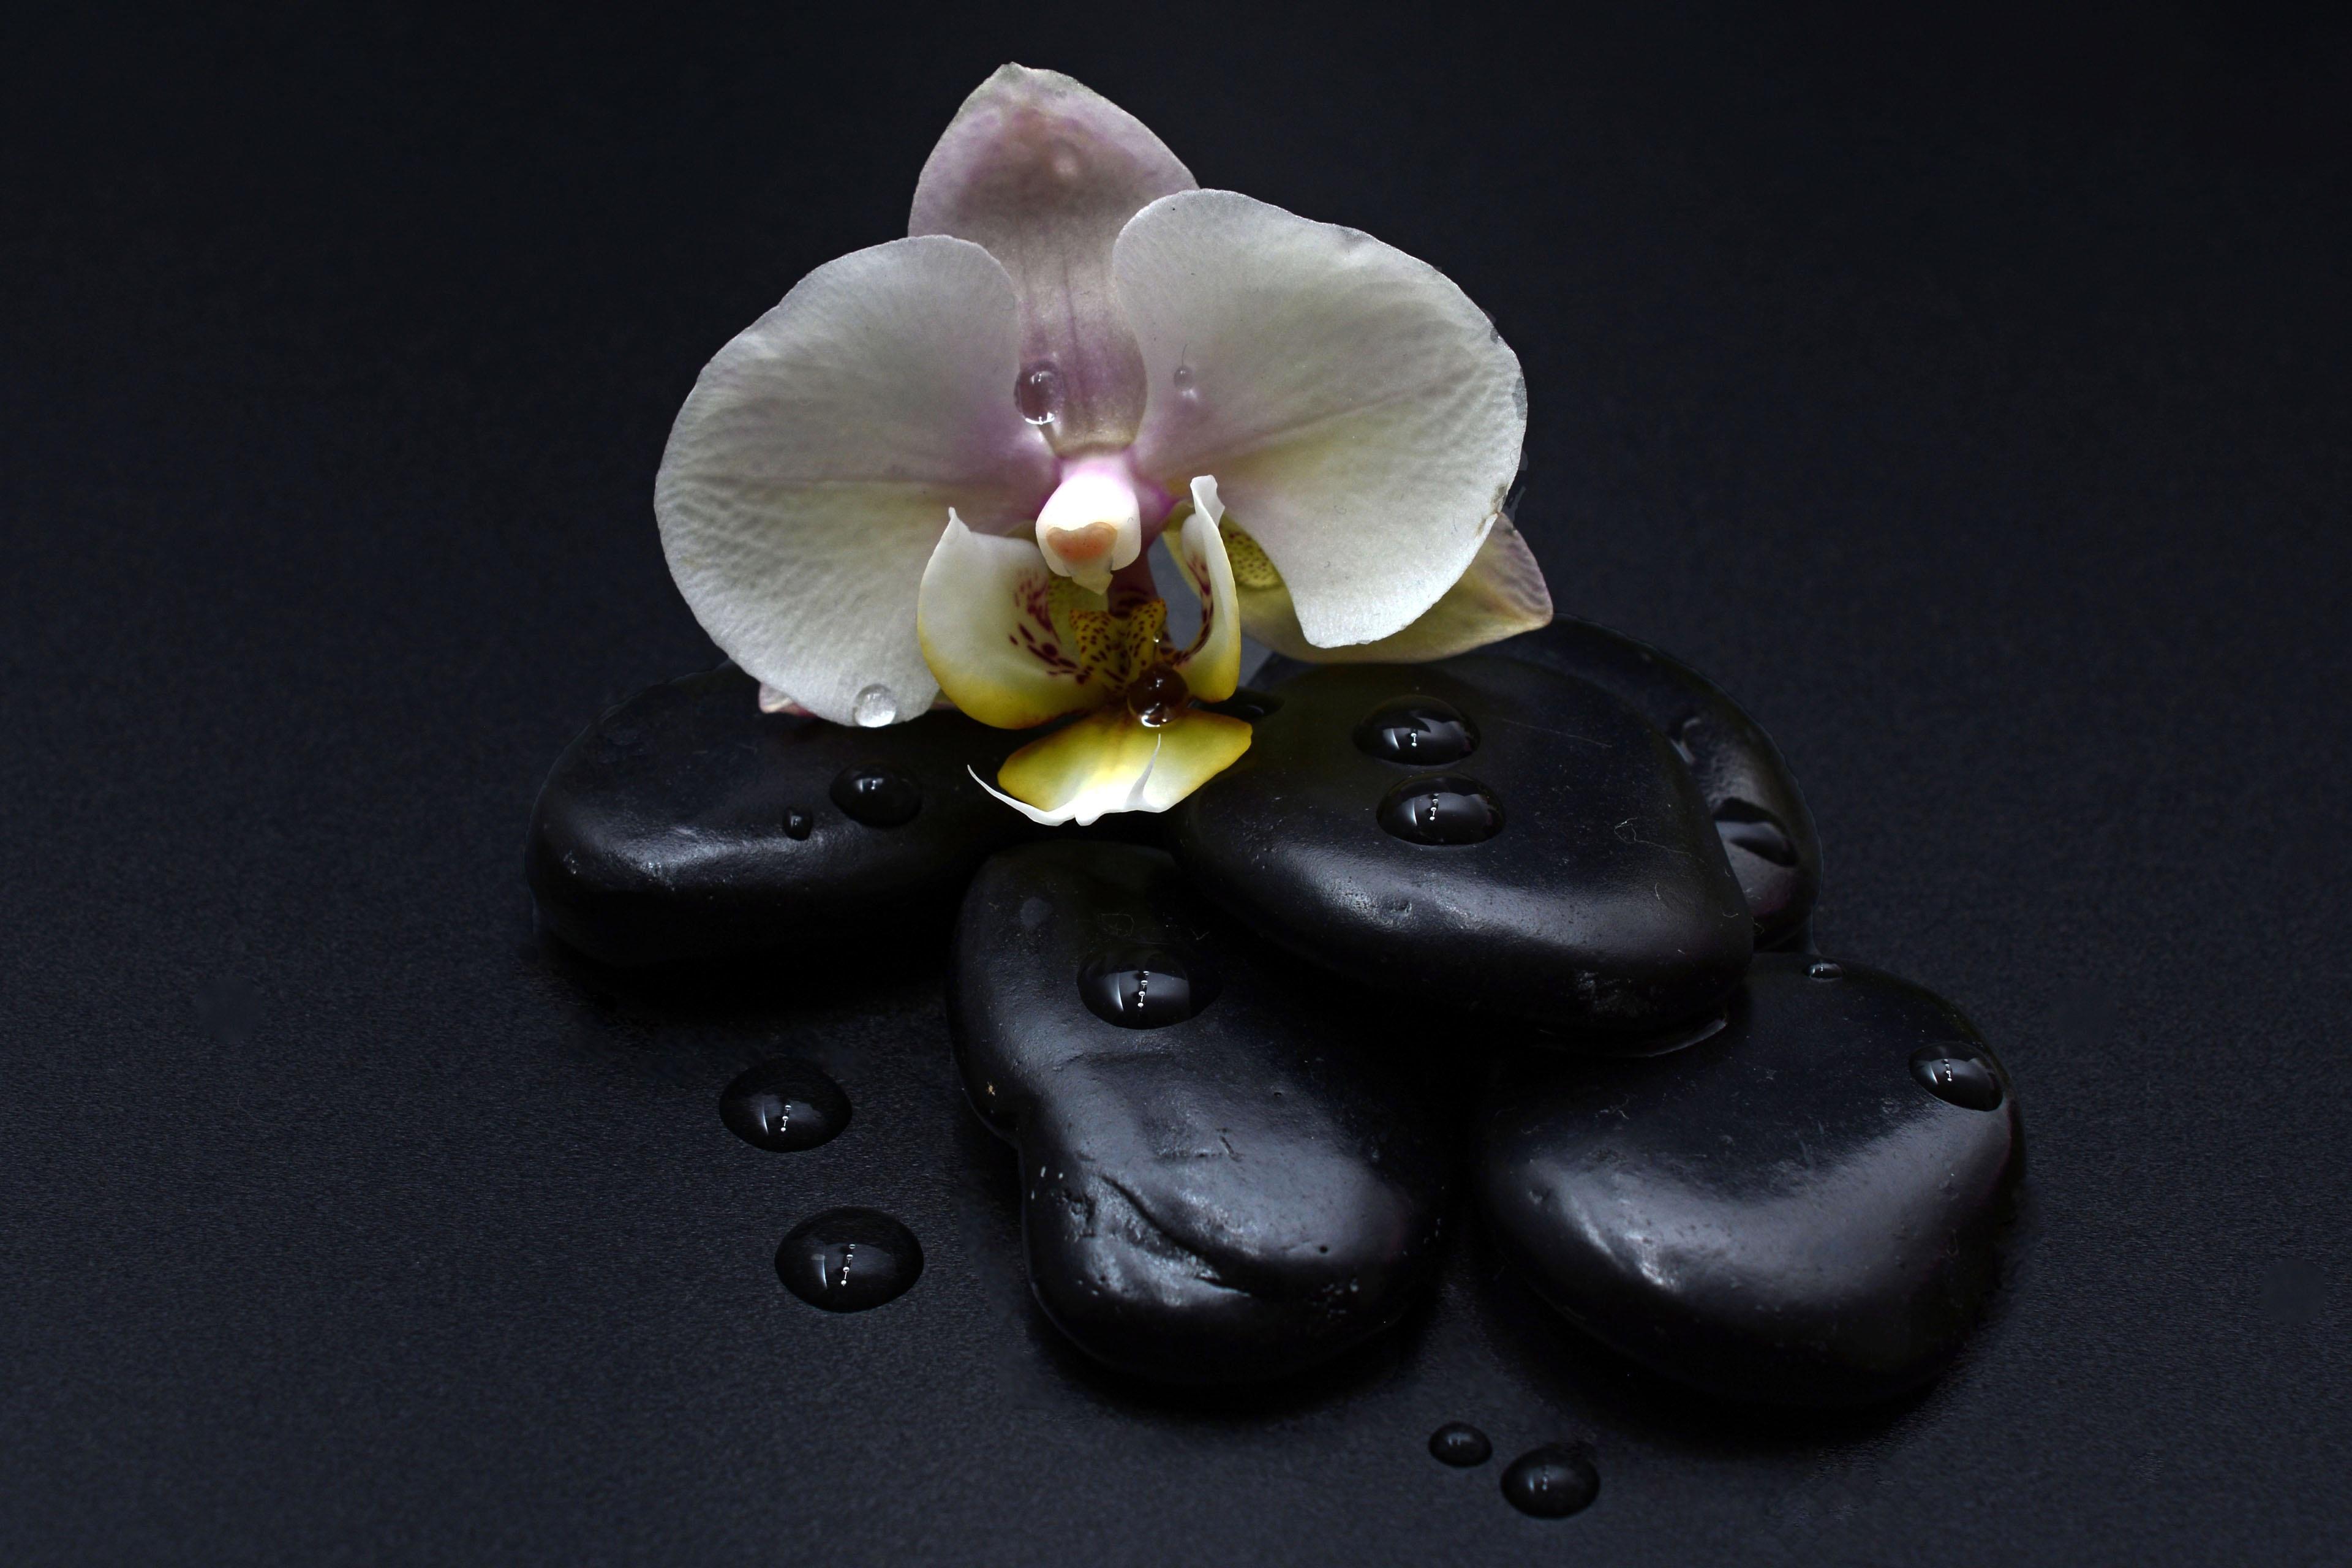 Free Images : plant, petal, relax, balance, black, close ...